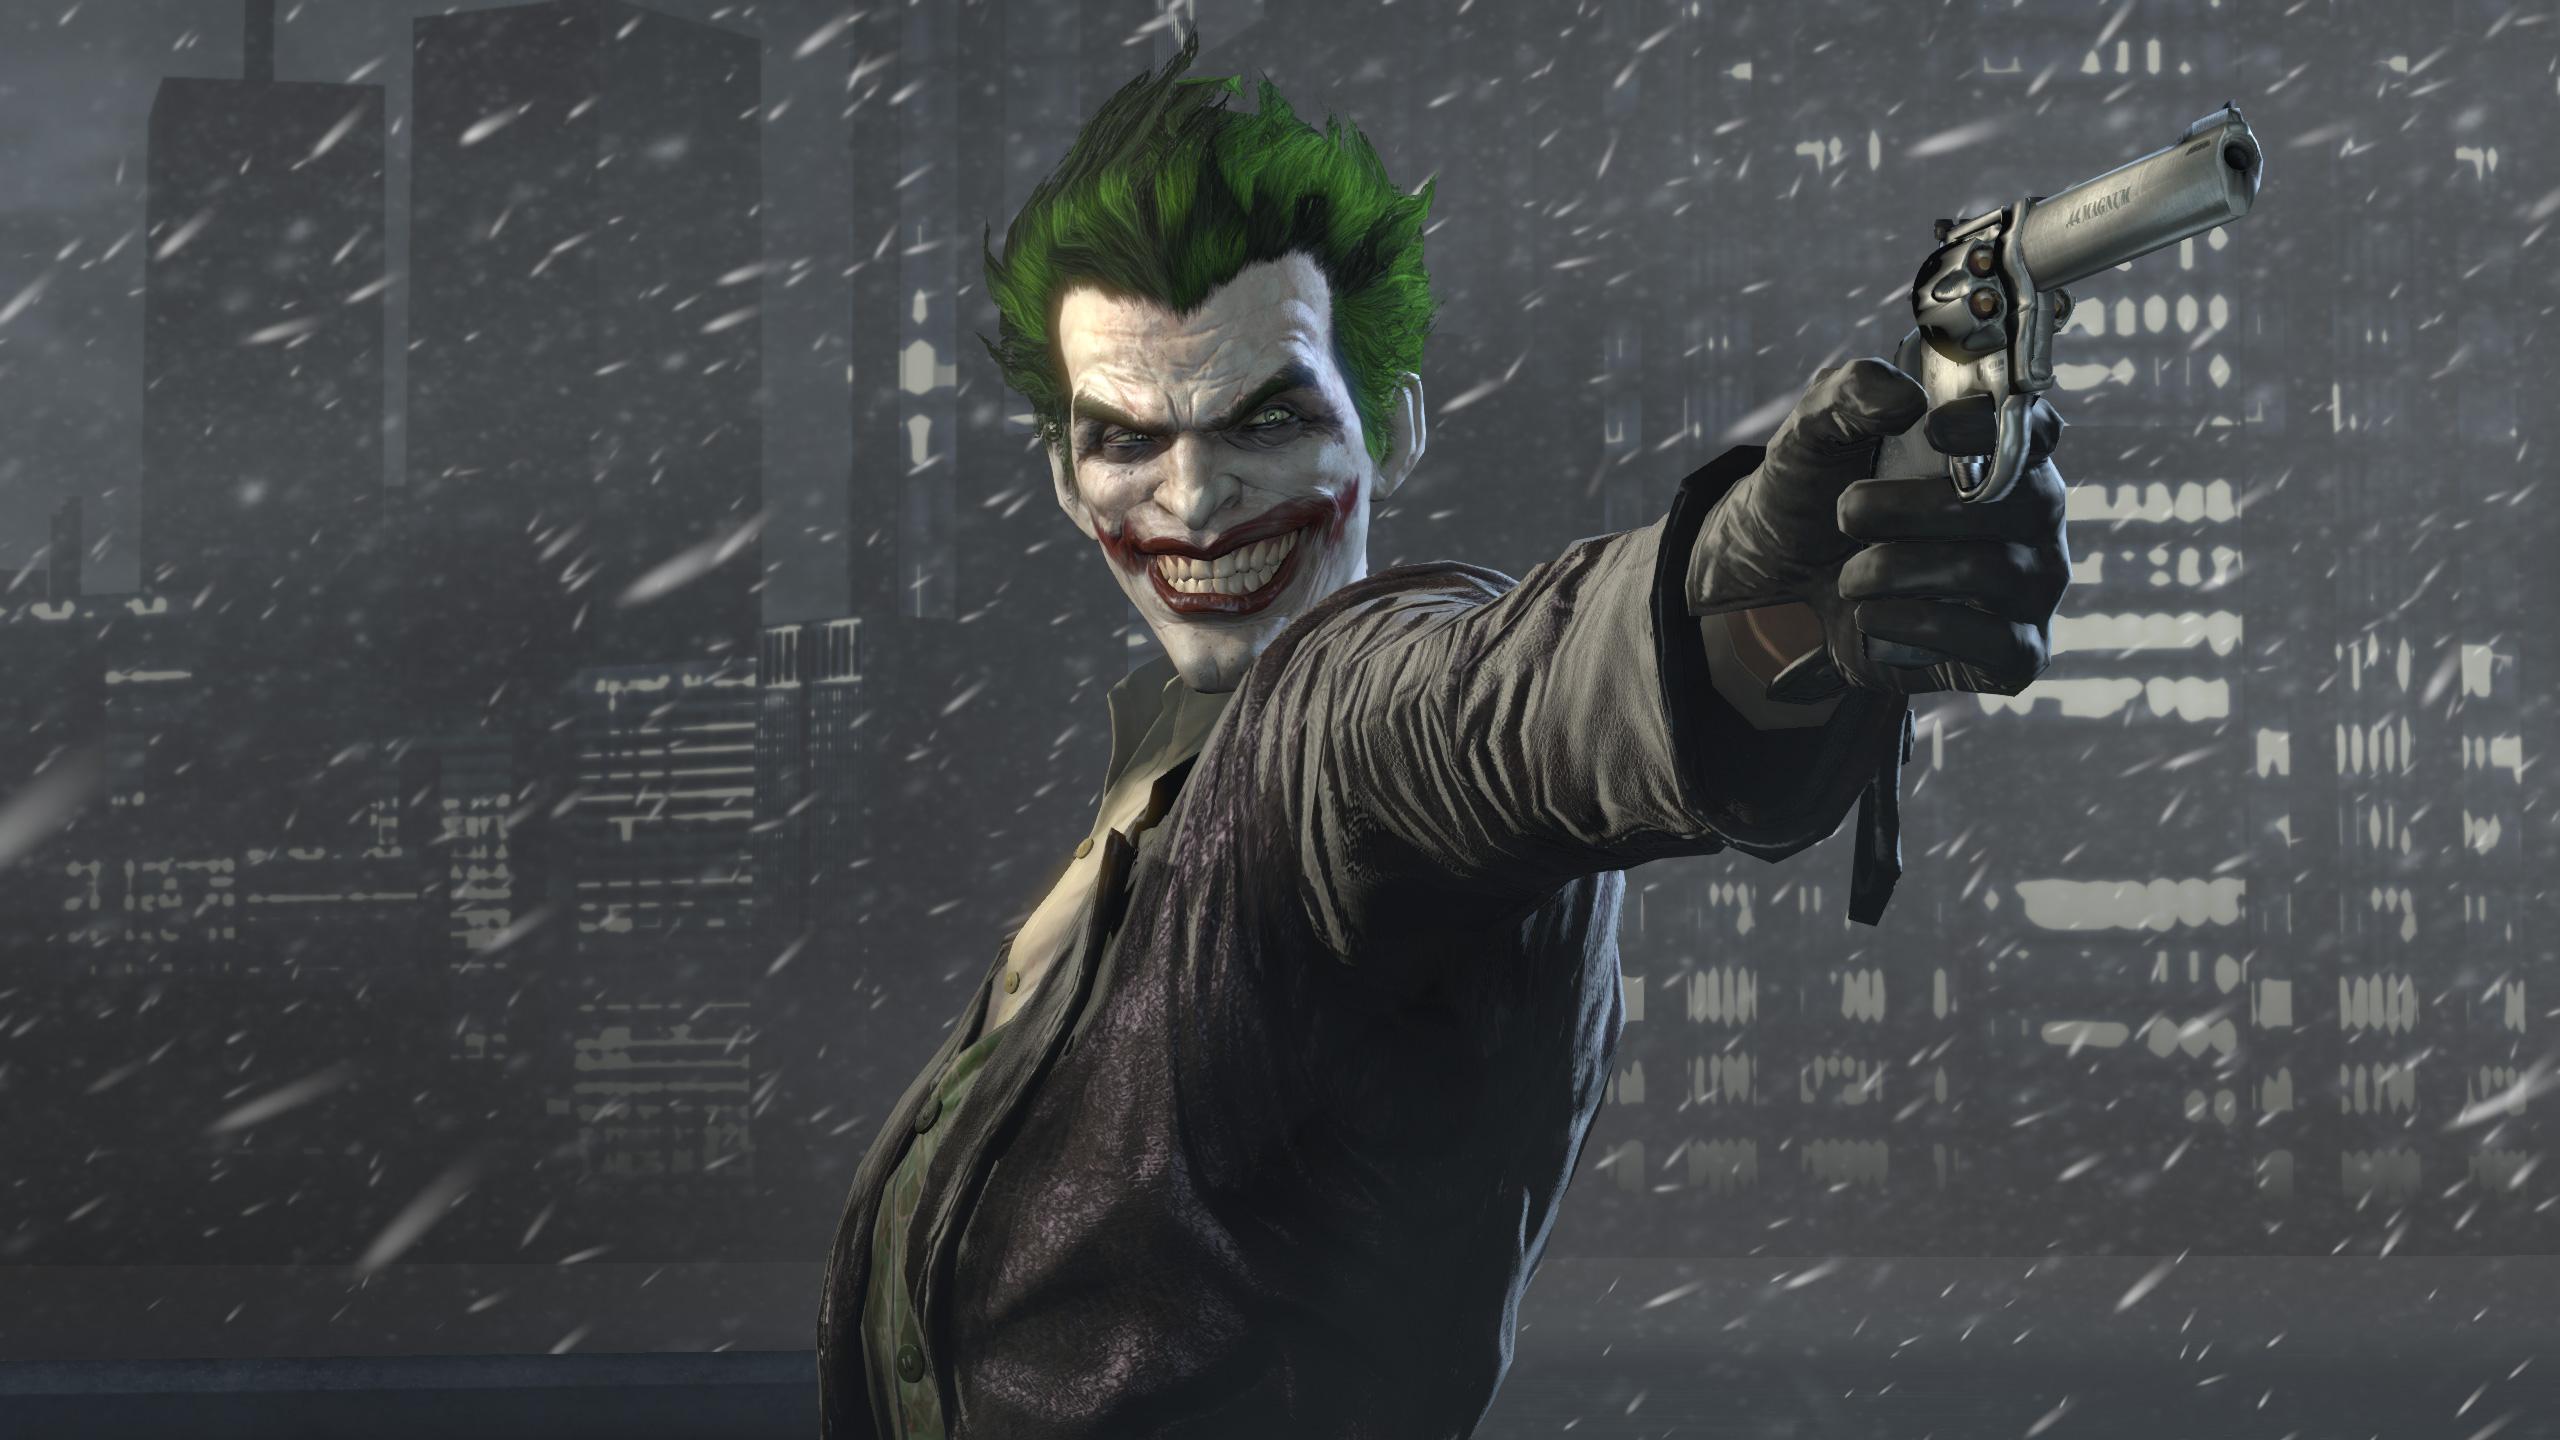 Joker batman arkham origins hd games 4k wallpapers for Joker wallpaper 4k